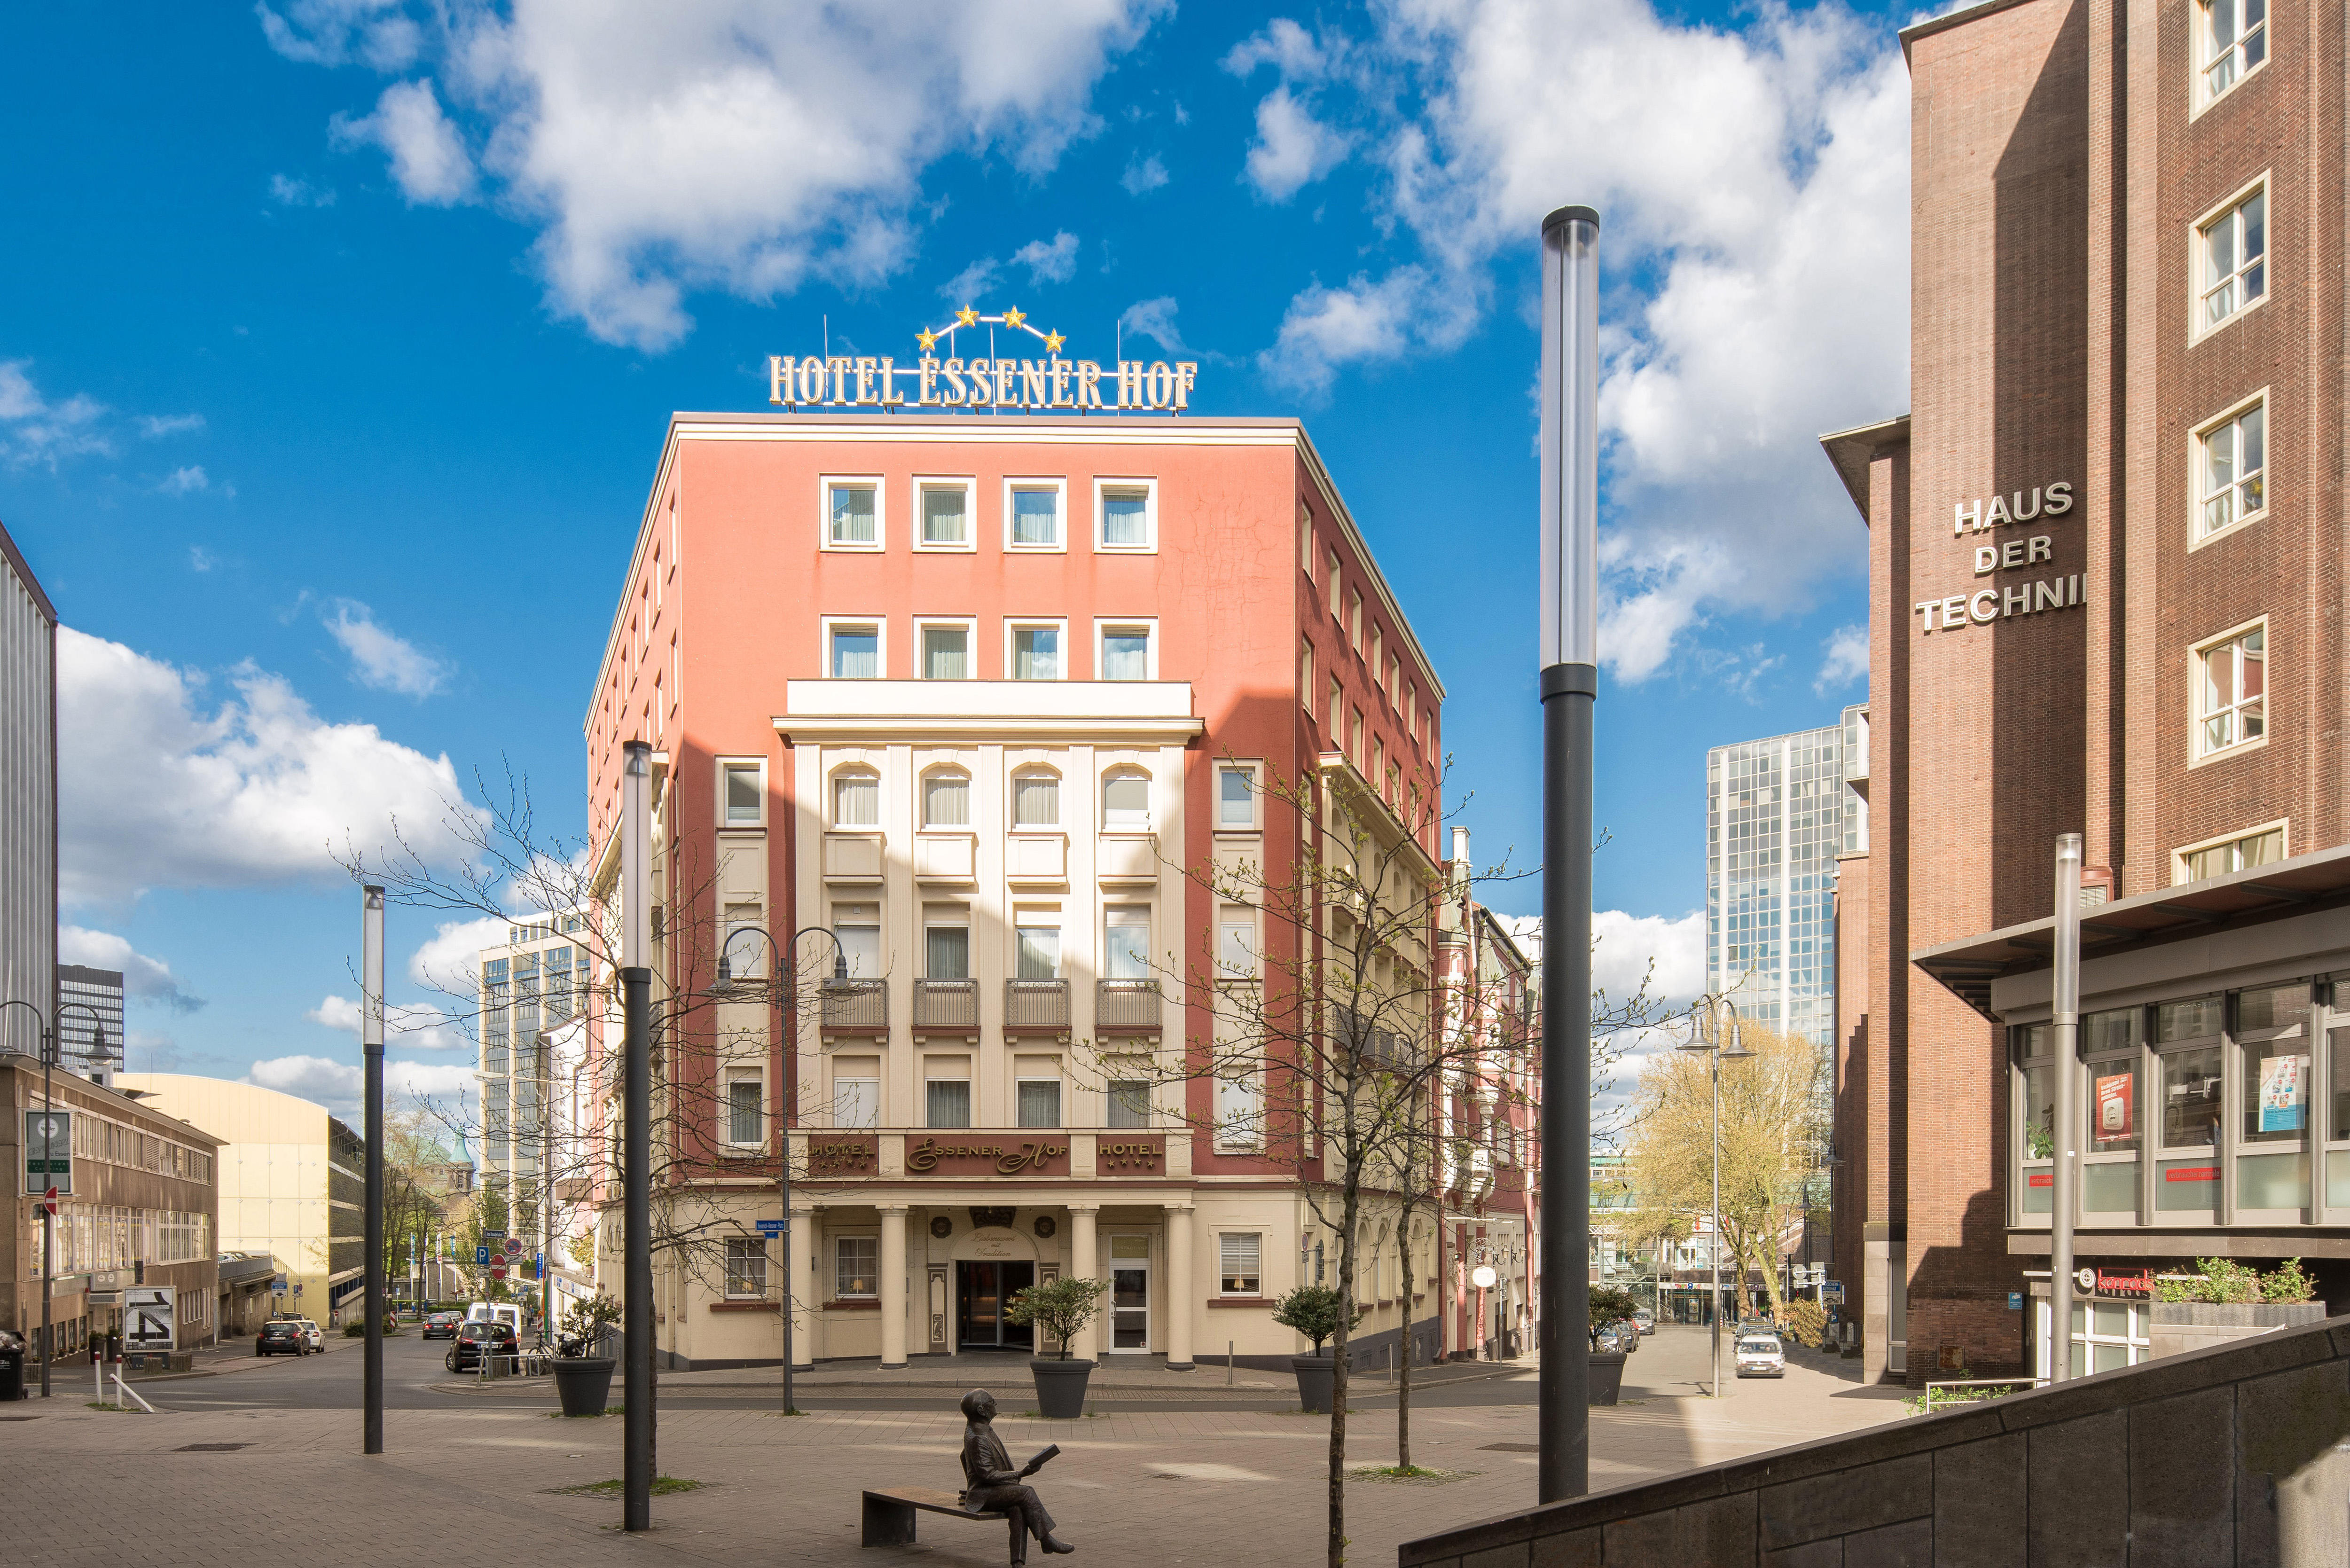 Hotel Essener Hof – Sure Hotel Collection by Best Western, Am Handelshof 5 in Essen